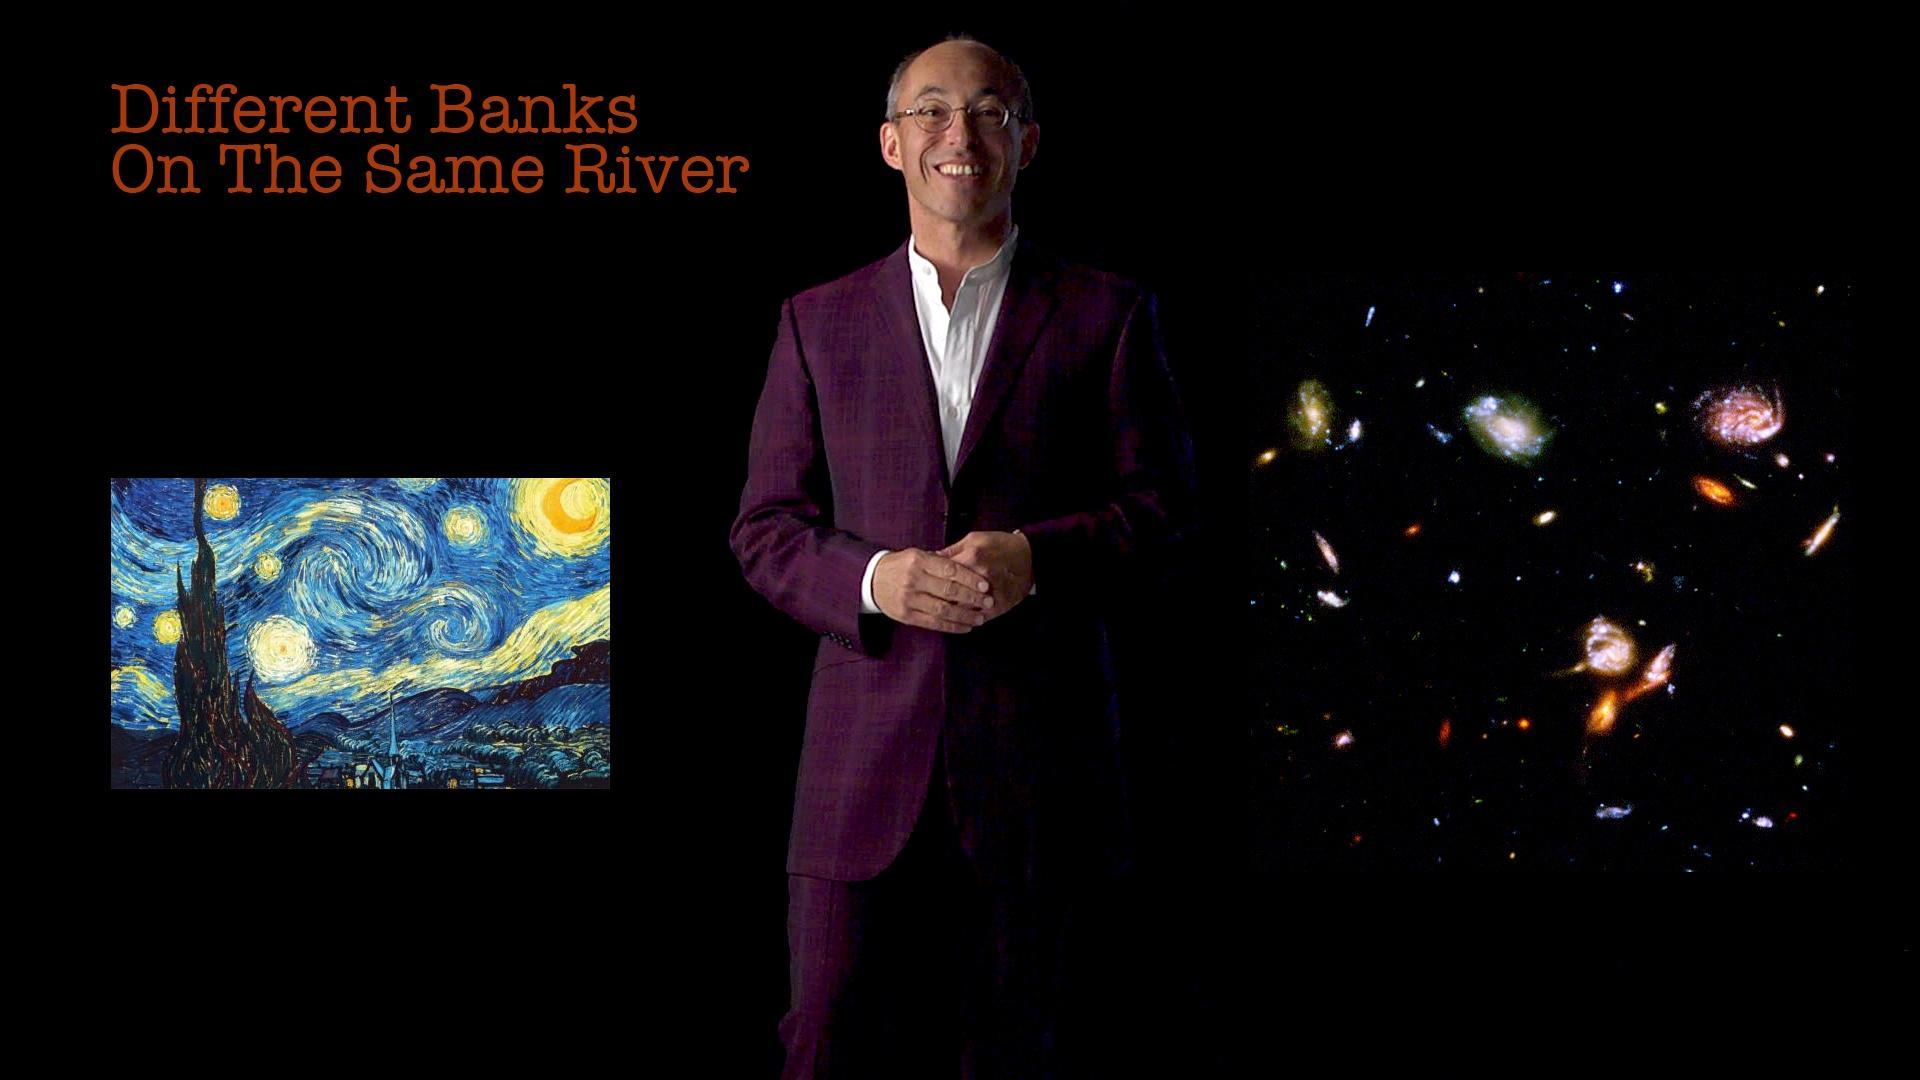 James Levine: Different Banks On The Same River image